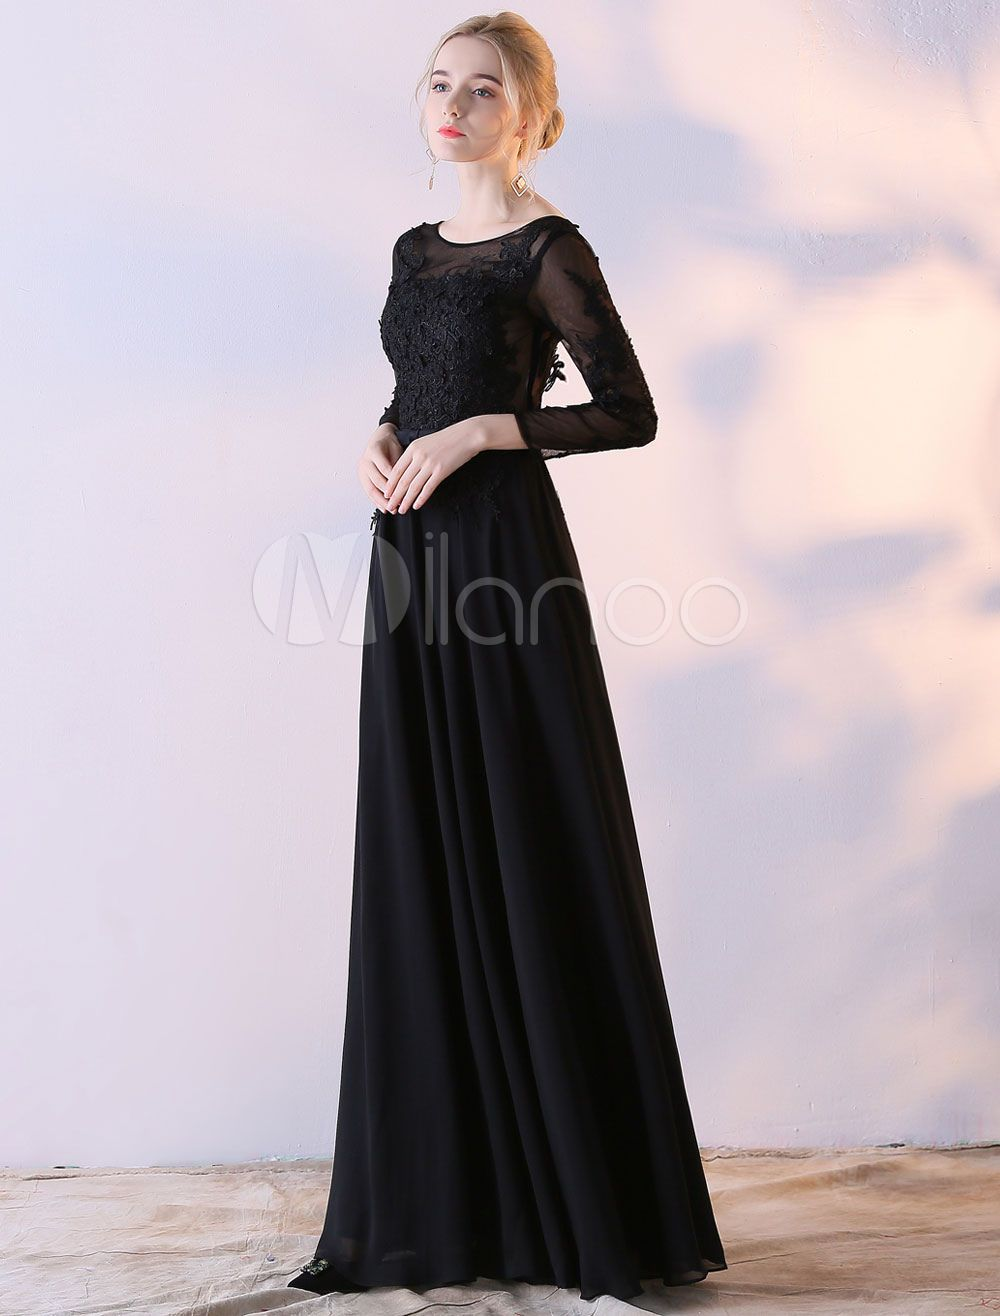 fe96e44a8085 Modest Maxi Prom Dresses